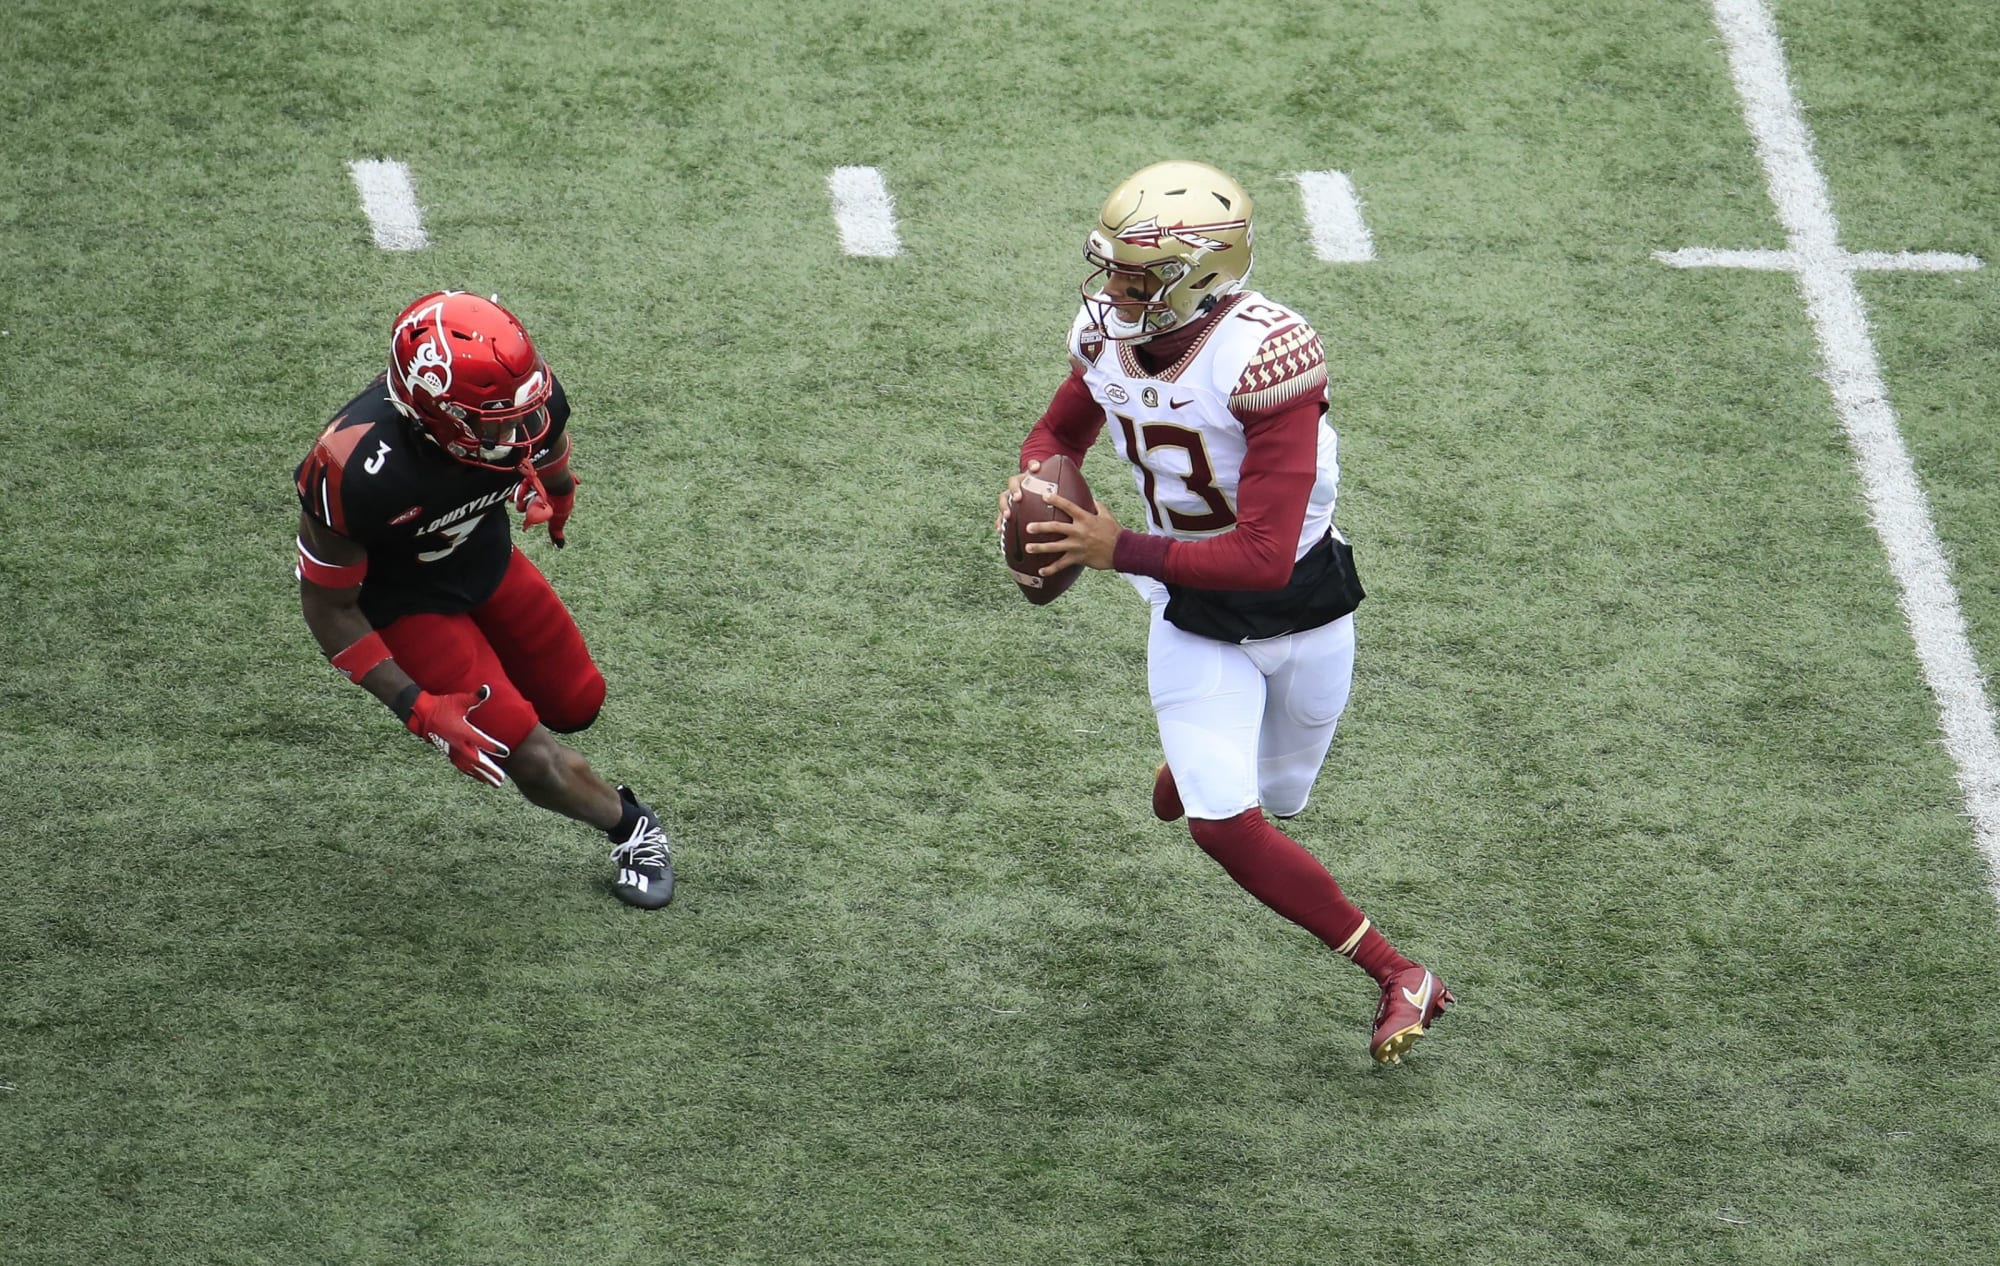 ACC Football Power Rankings, Week 13: Florida State flirts with bottom